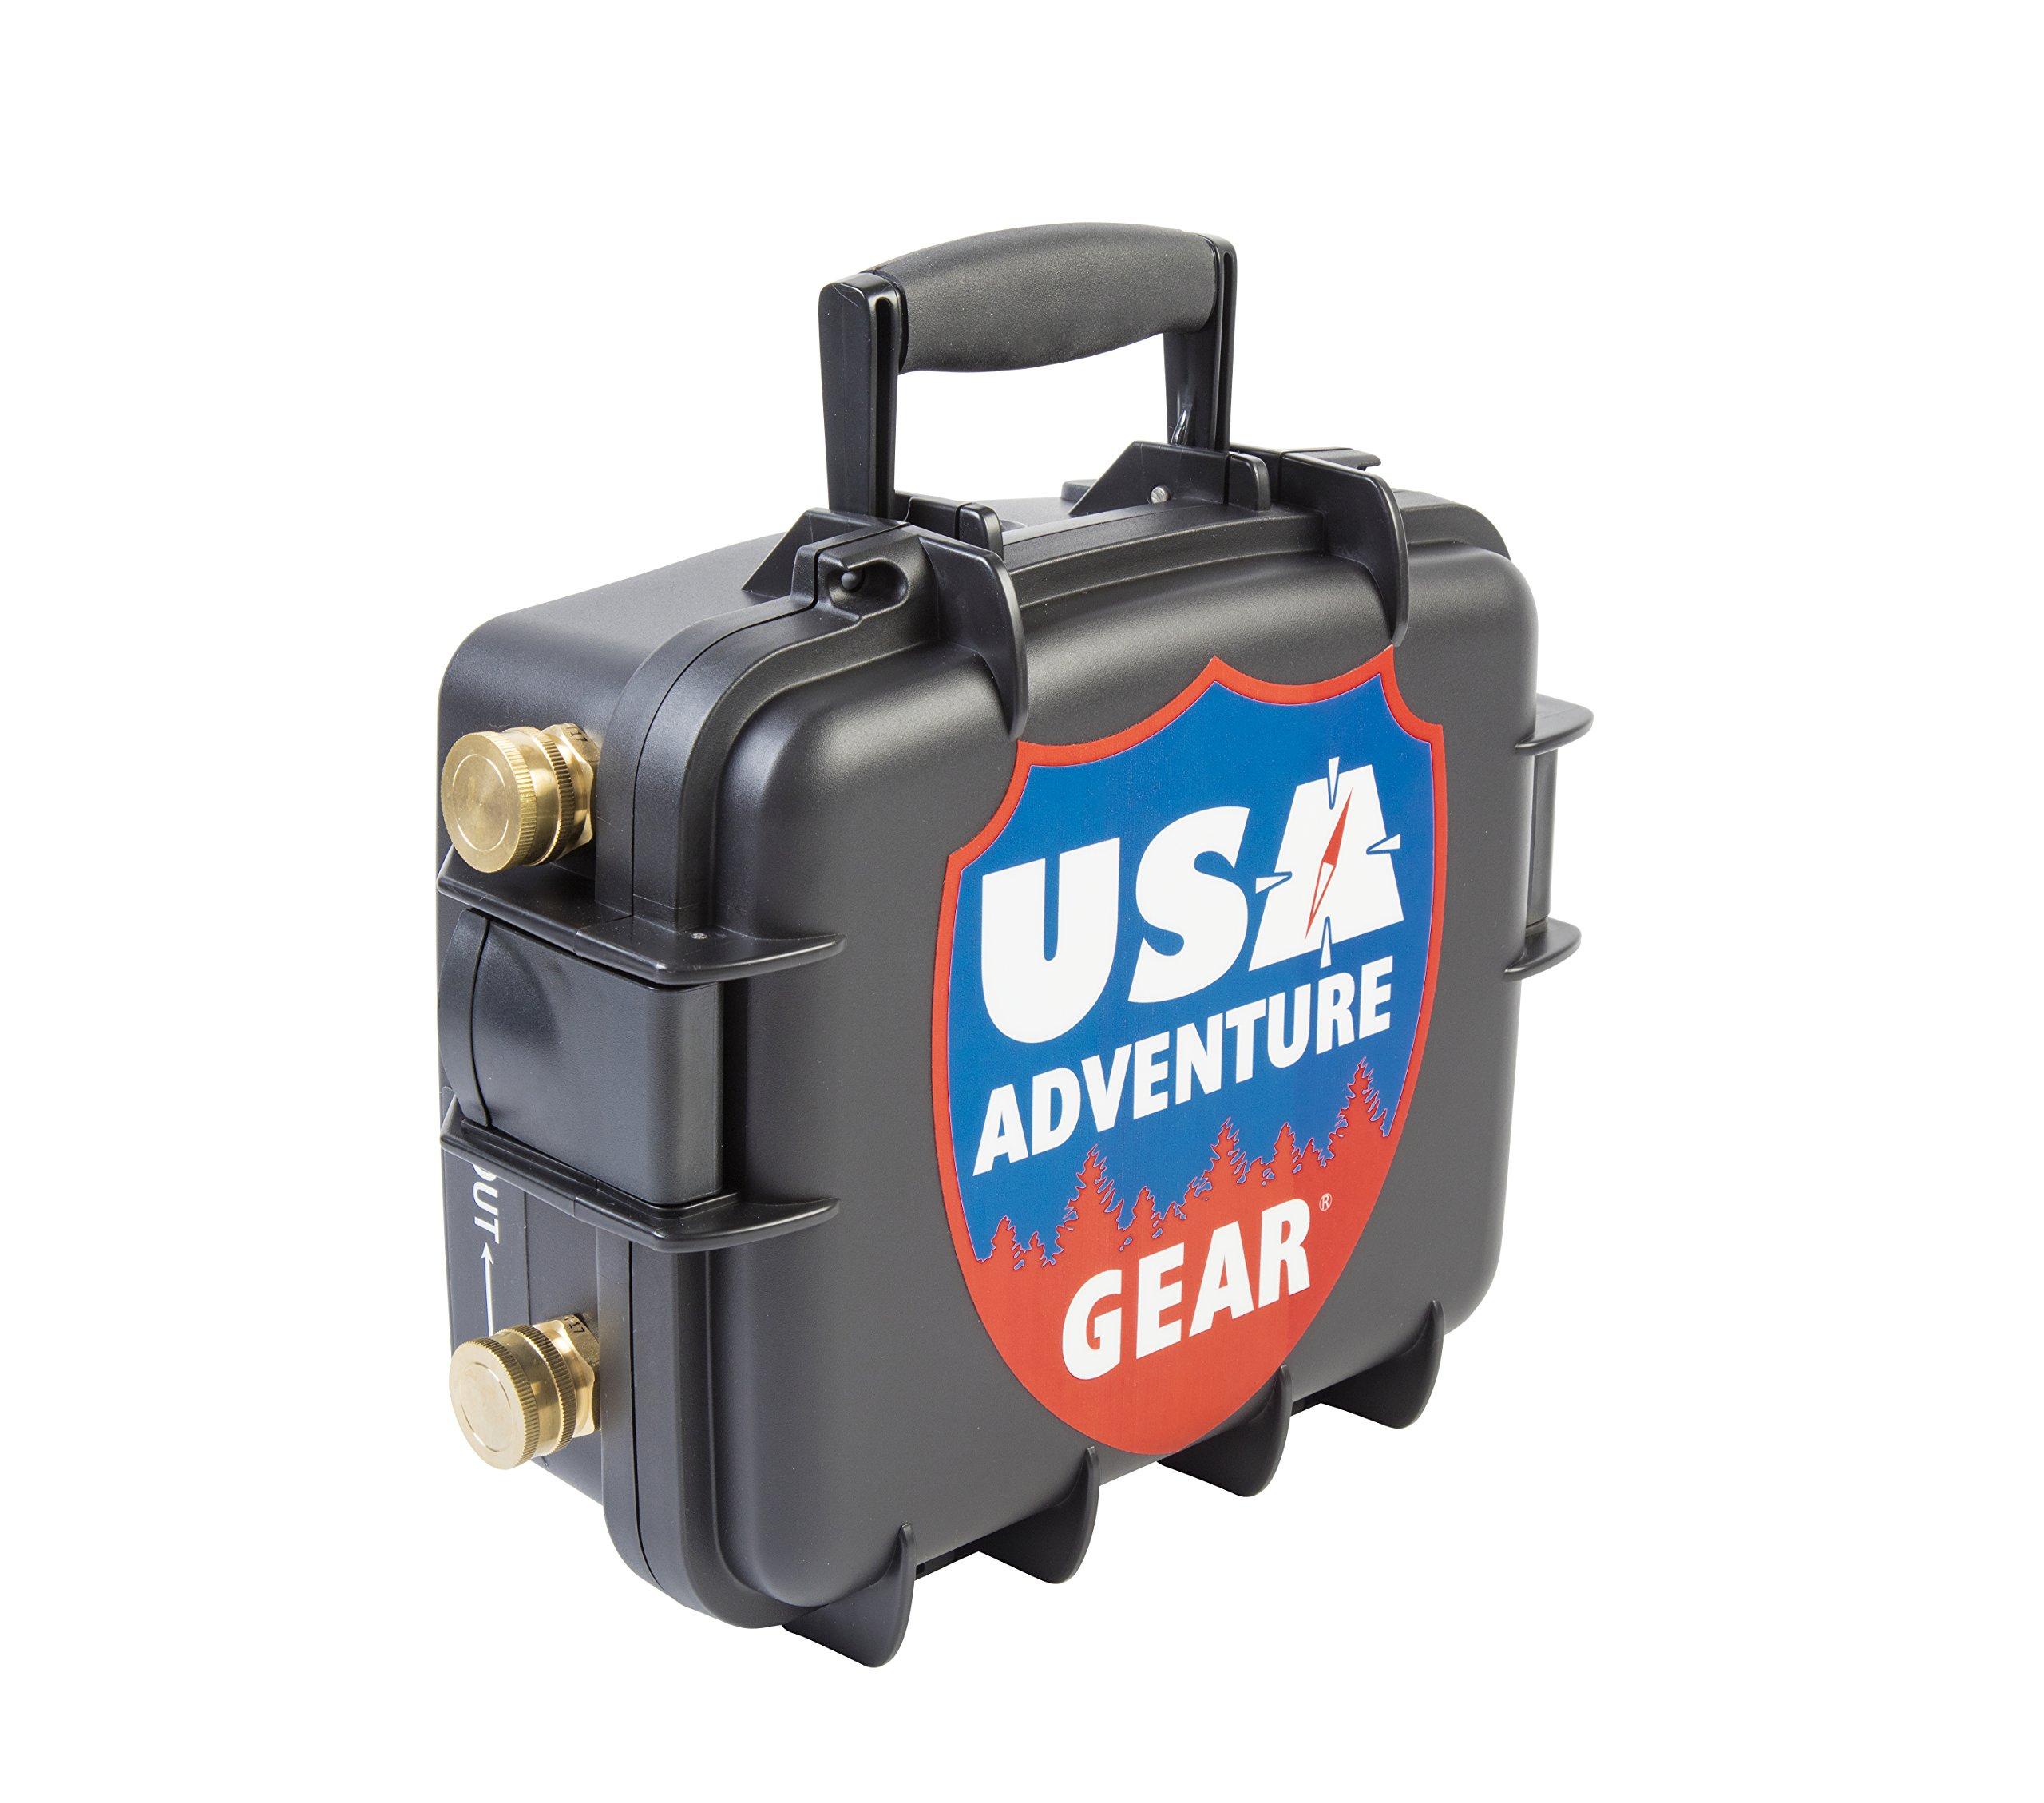 Glacier XE 12v Portable Water Pump featuring USA's 5300 ProGear Professional Grade Pump by USA Adventure Gear (Image #1)